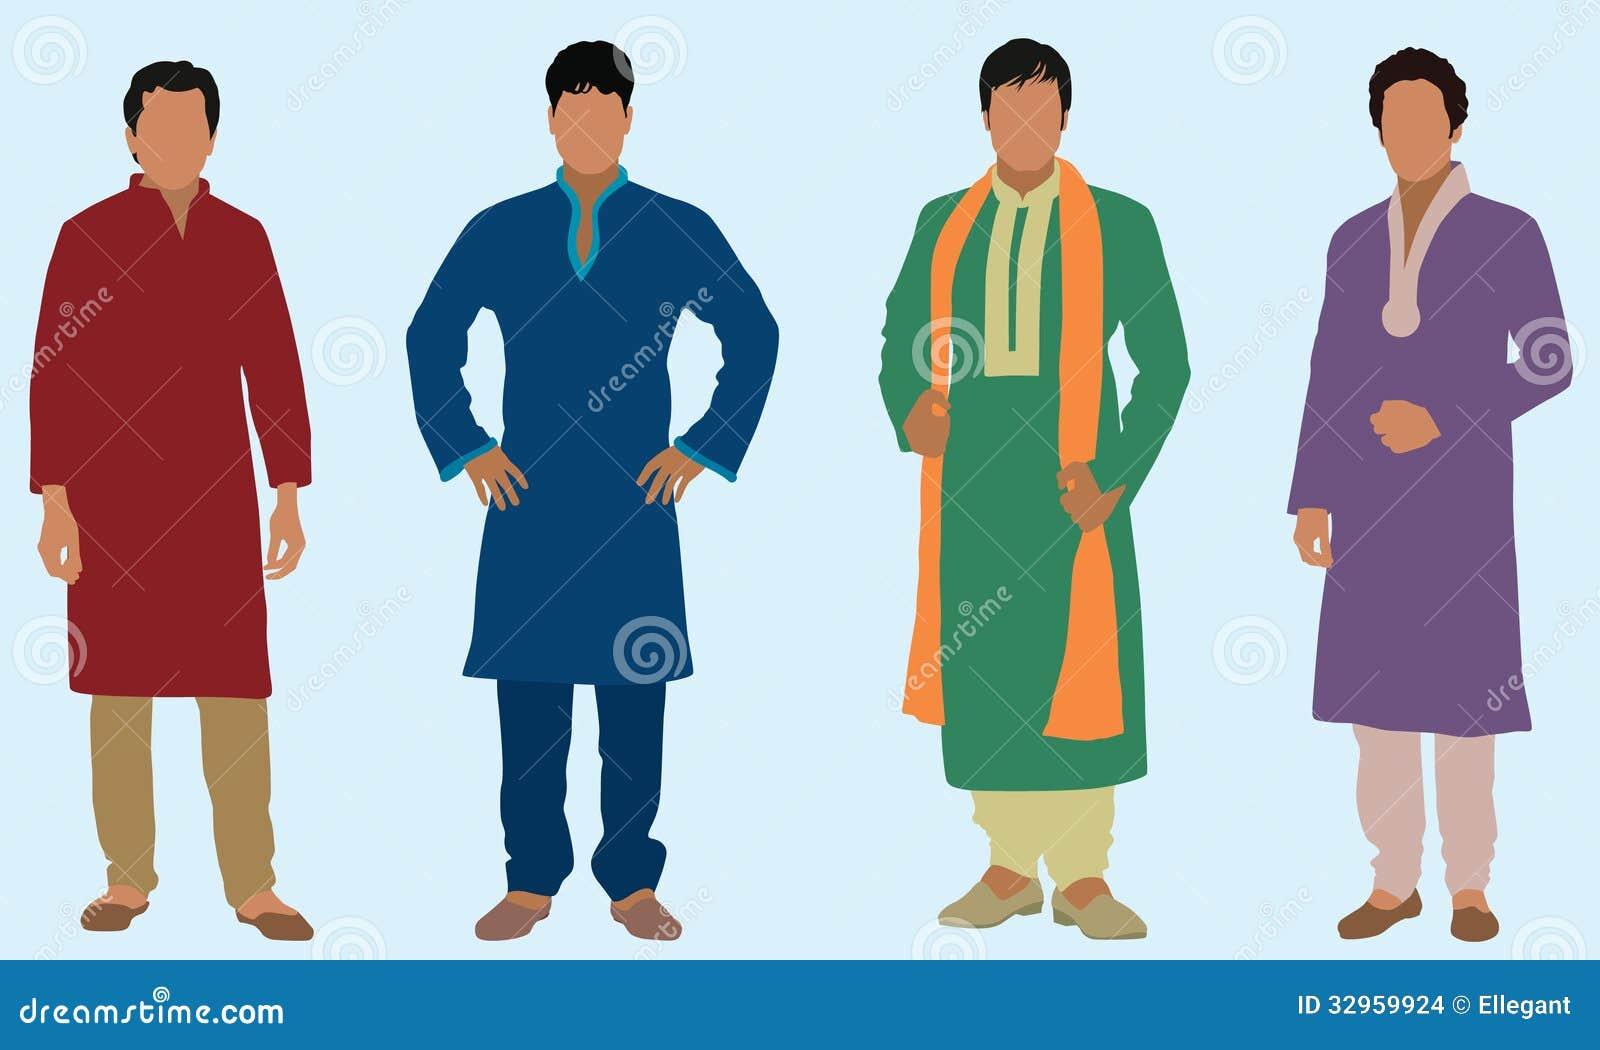 East Indian Men Stock Vector Illustration Of Silhouette 32959924